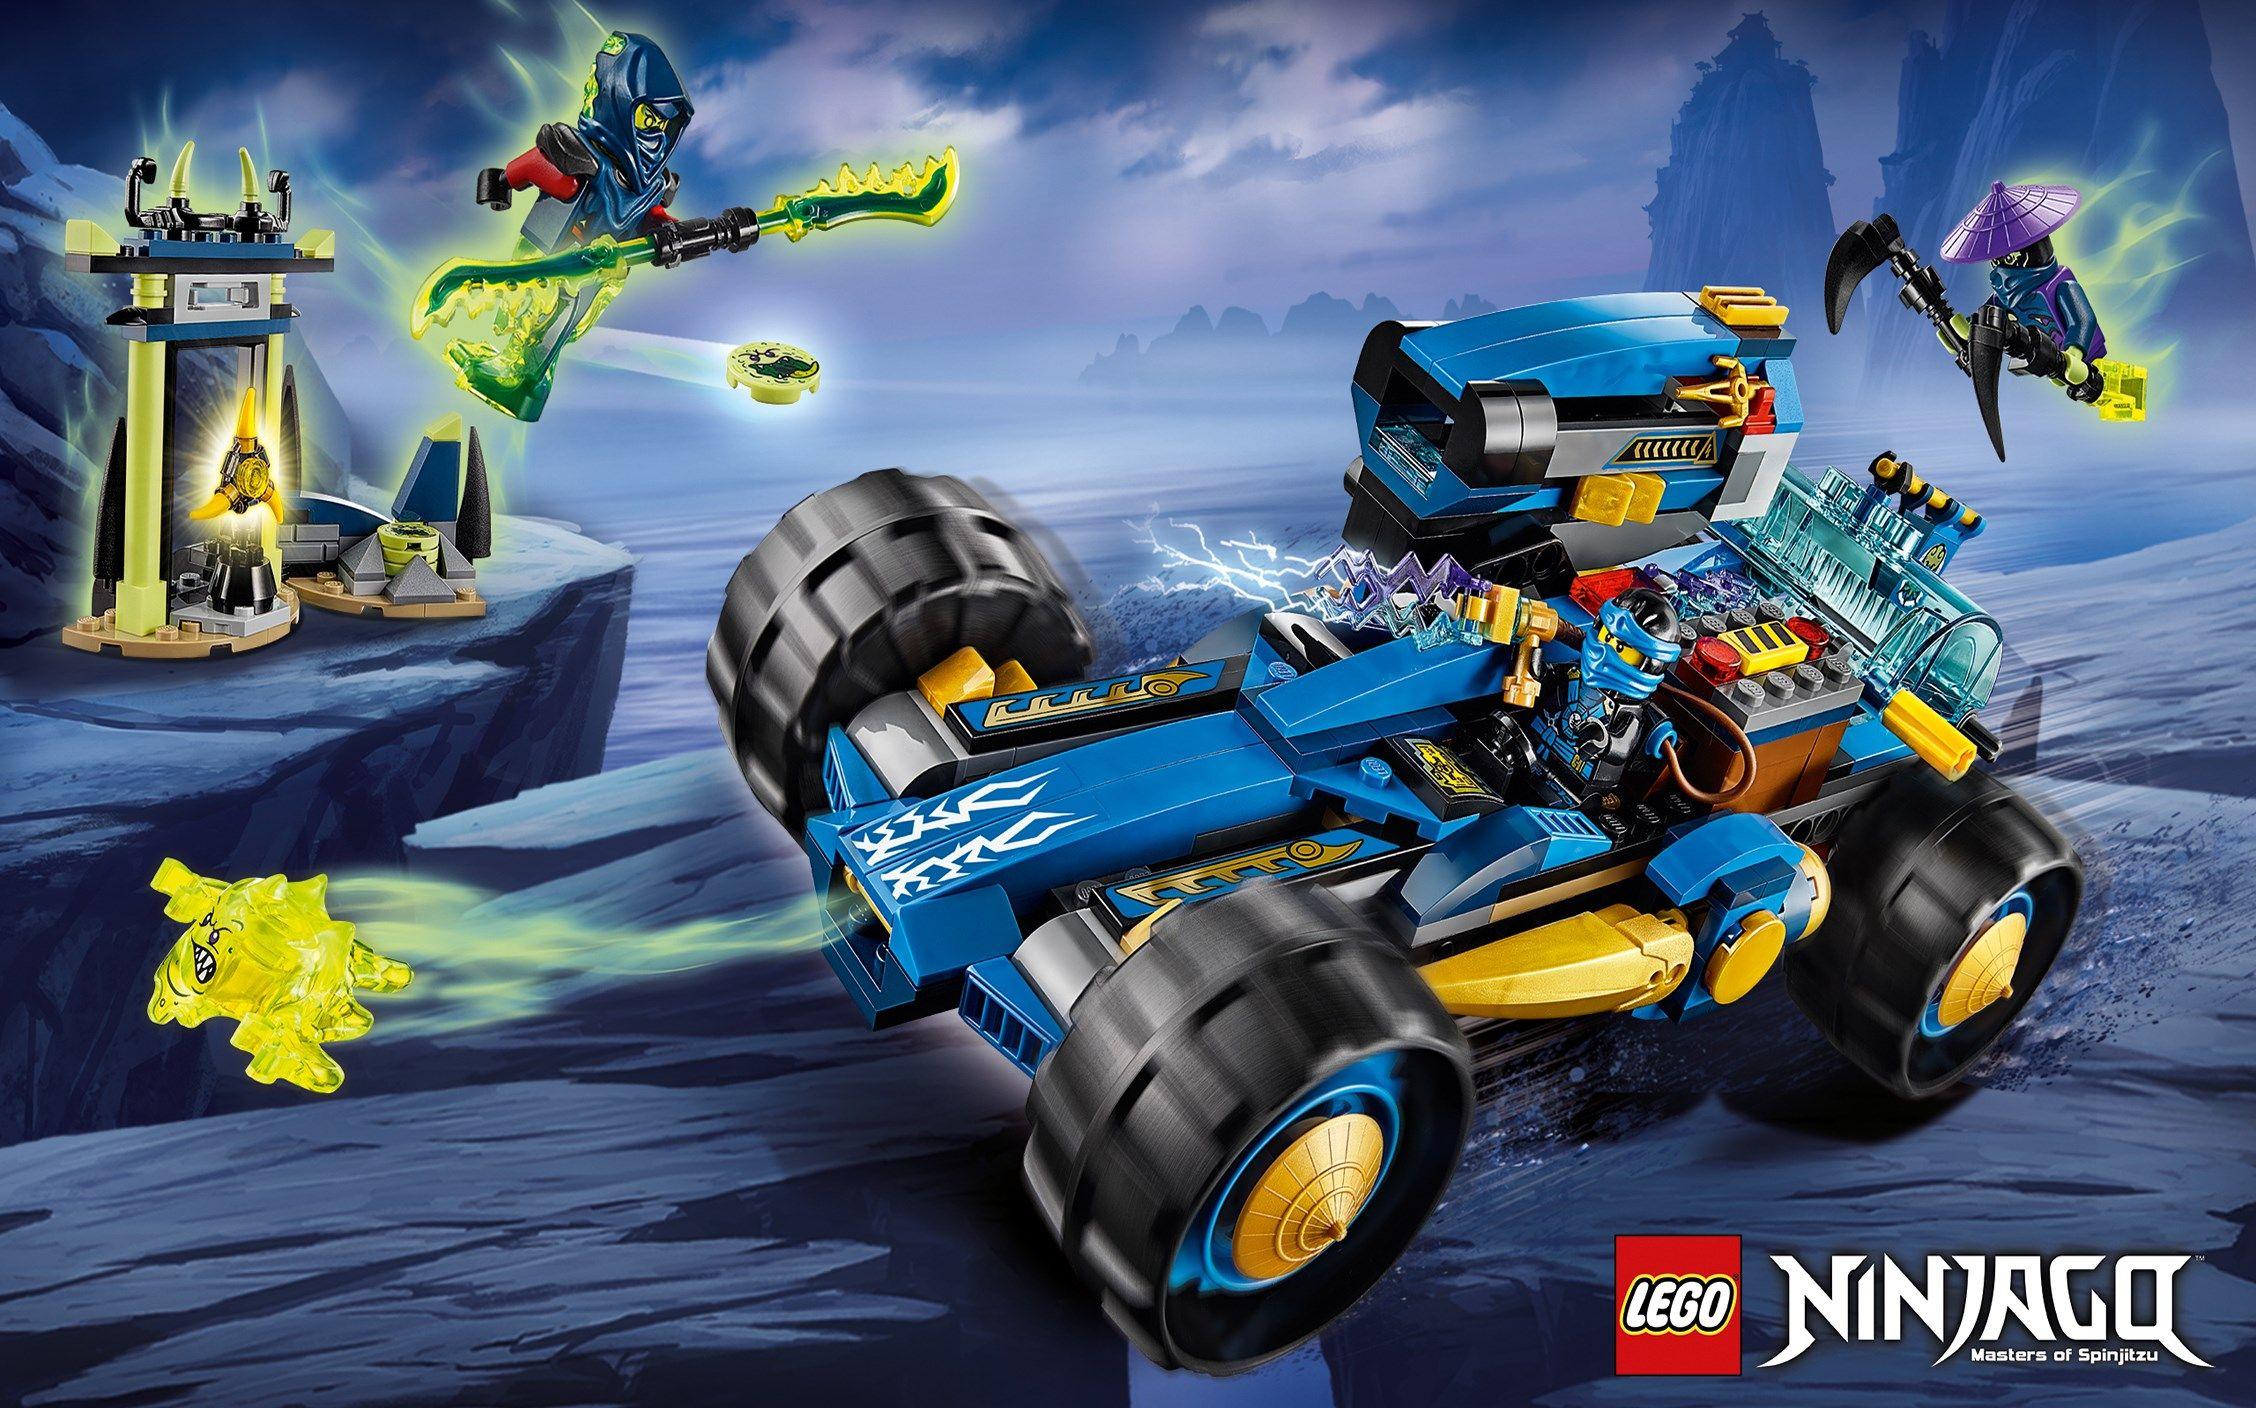 Lego Ninjago Image Desktop Nexus Wallpaper 2075 KB